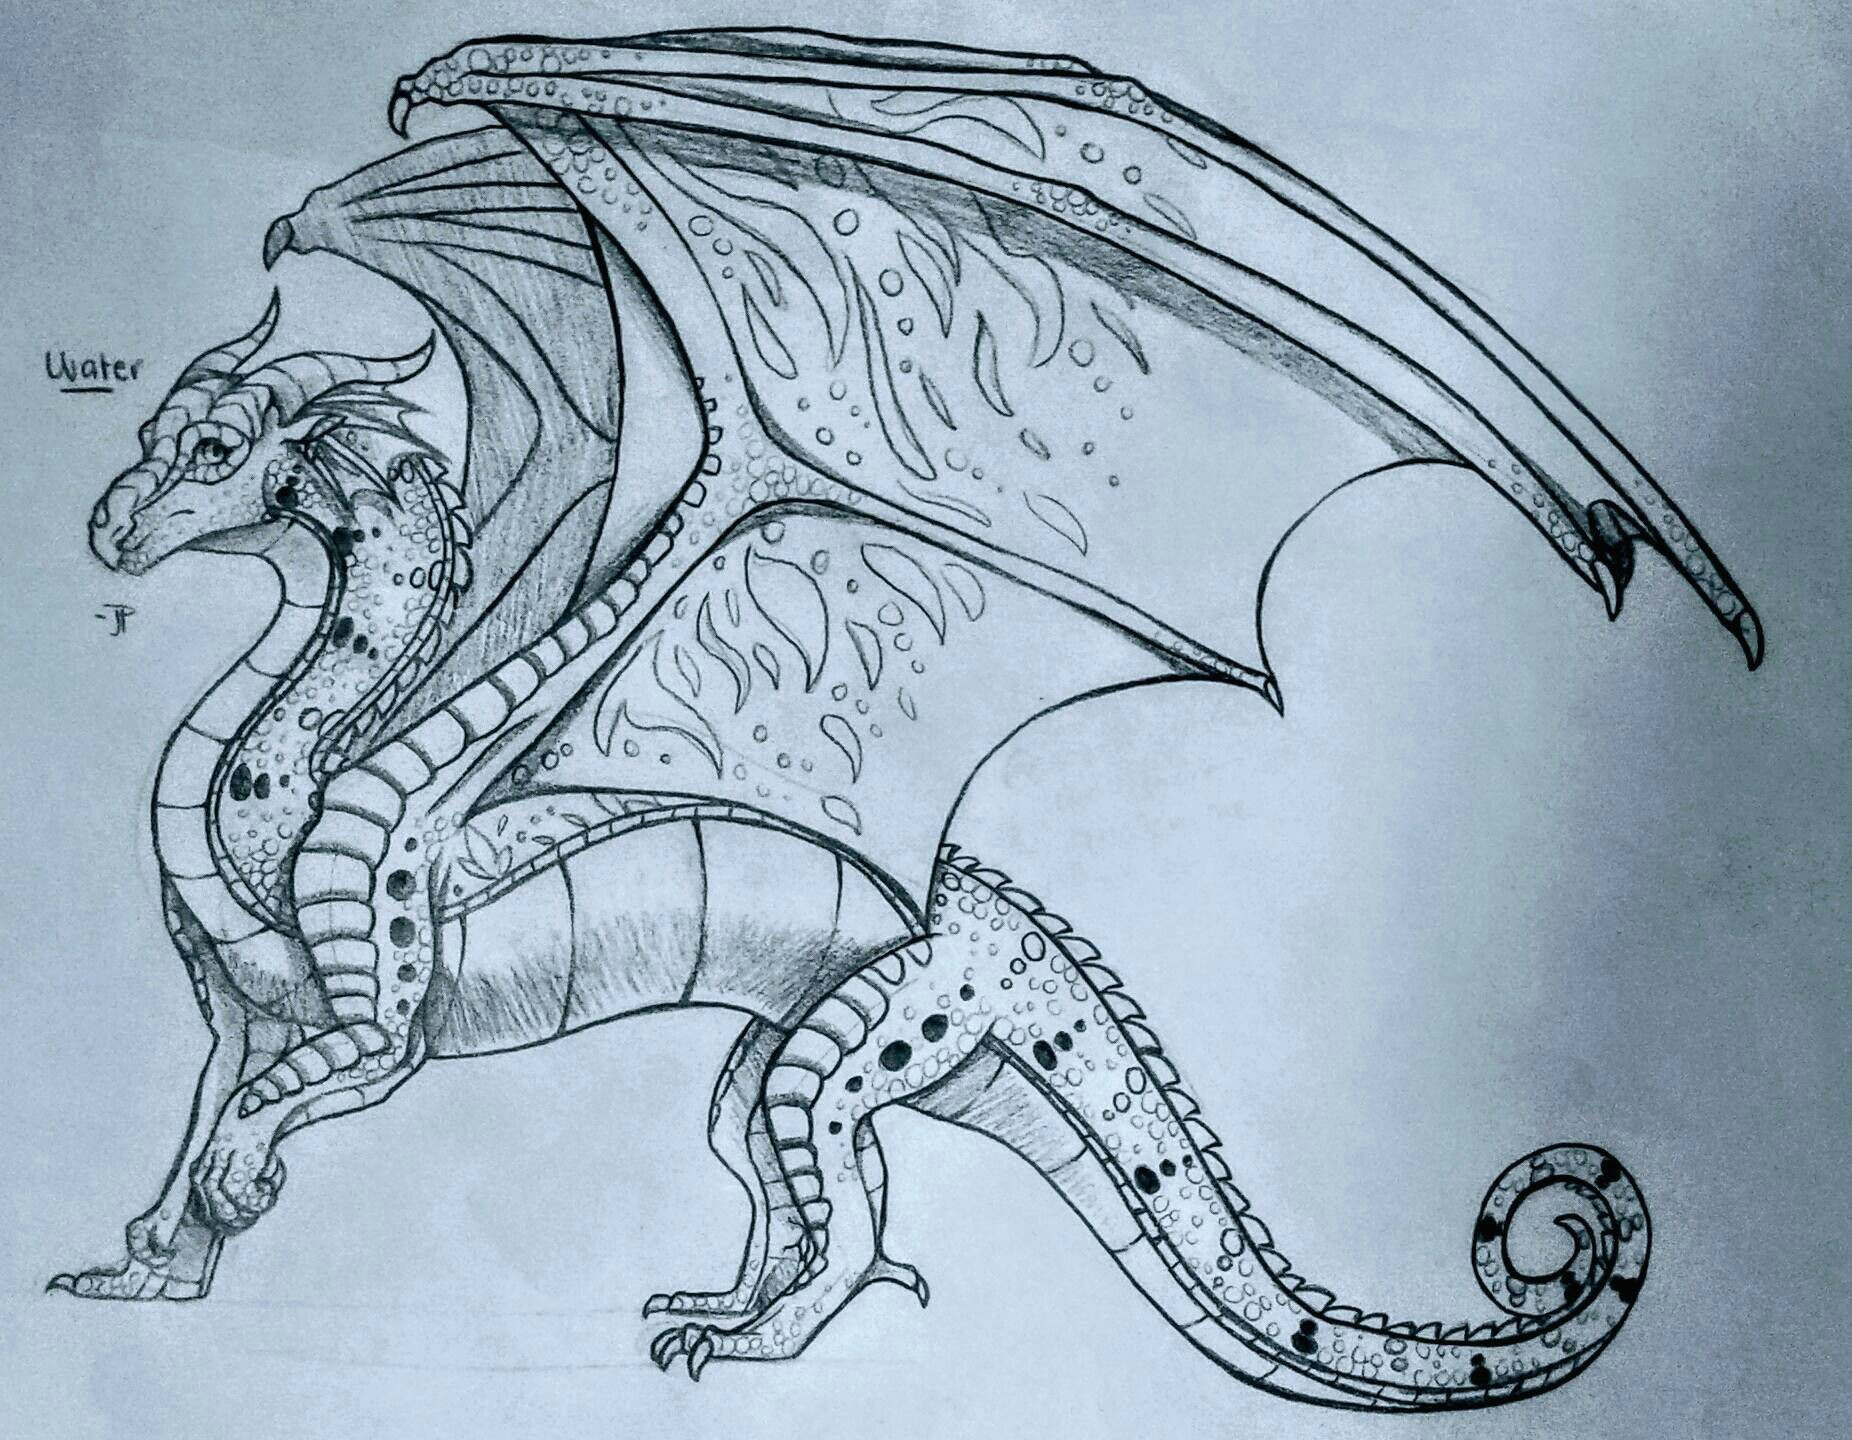 rainwing amazing drawings cool drawings pencil drawings dragon drawings wings of fire